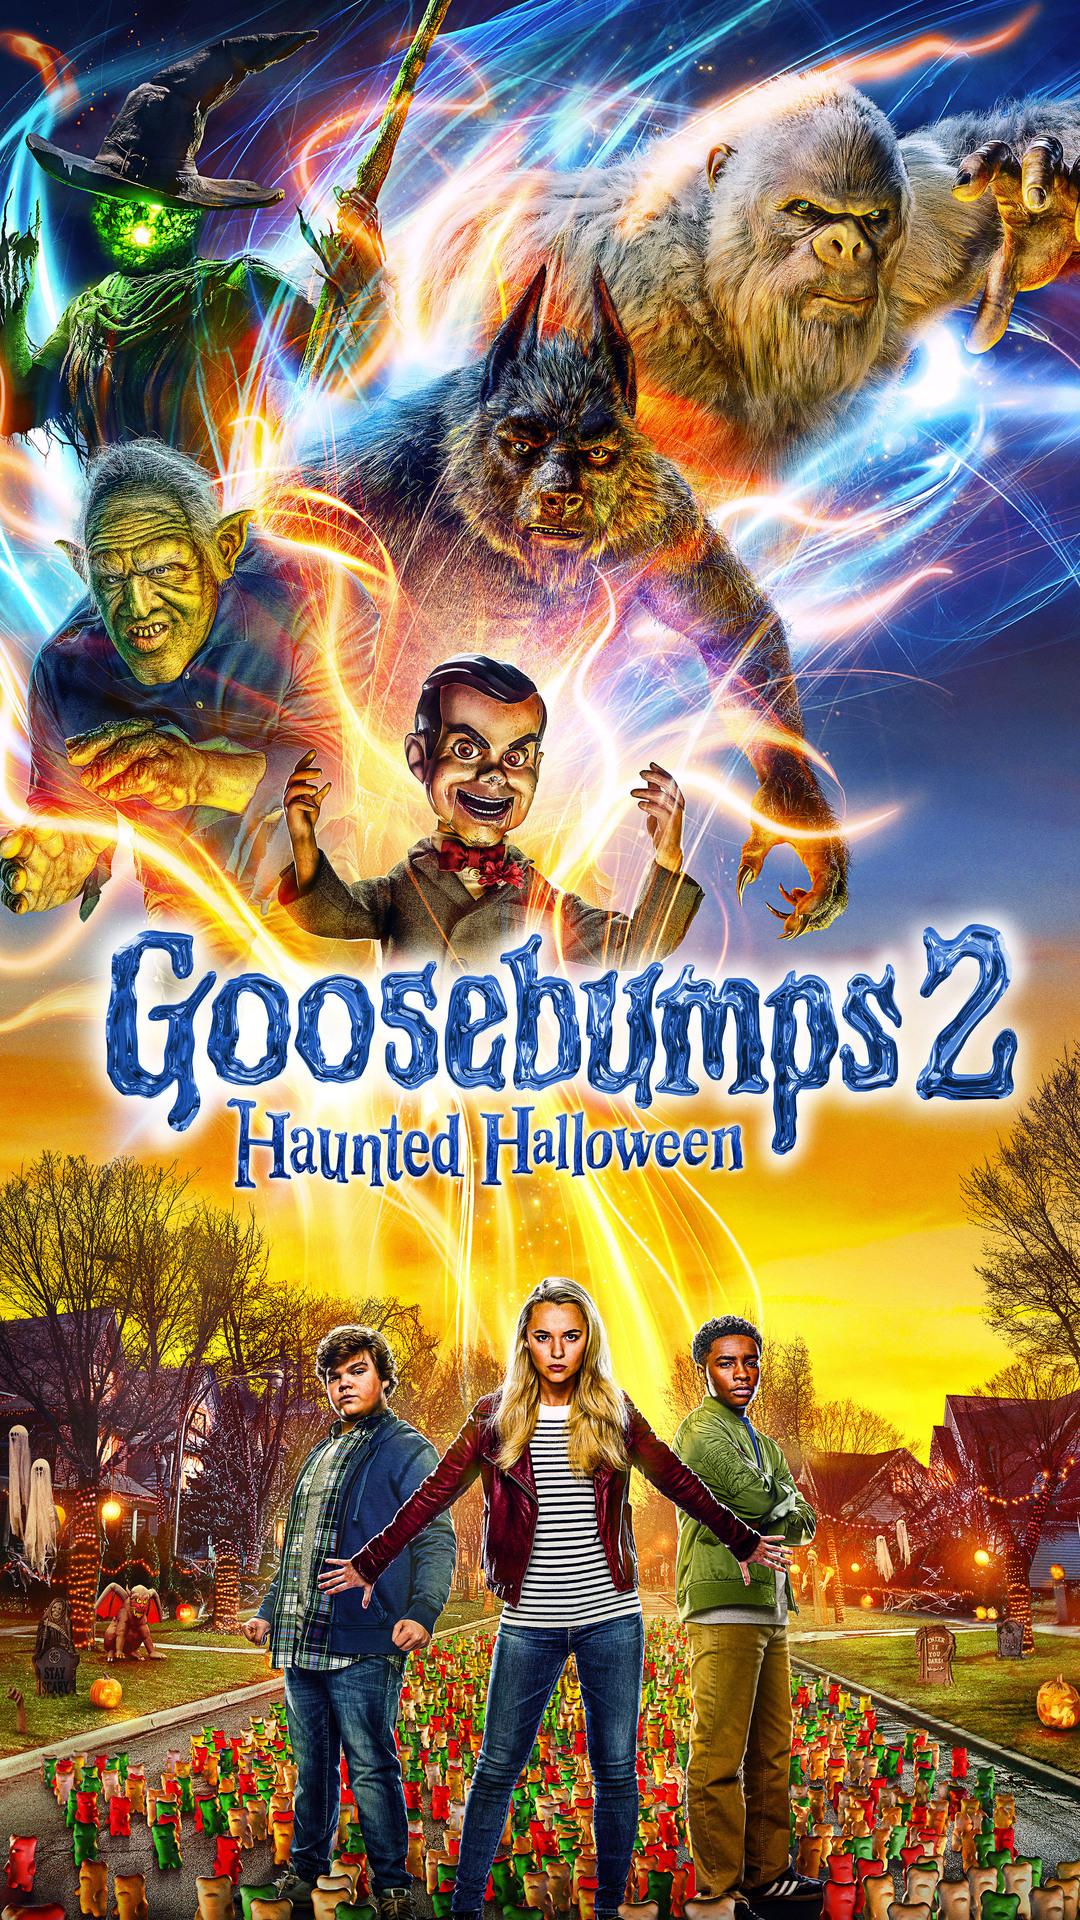 goosebumps-2-haunted-halloween-cast-4k-xh.jpg